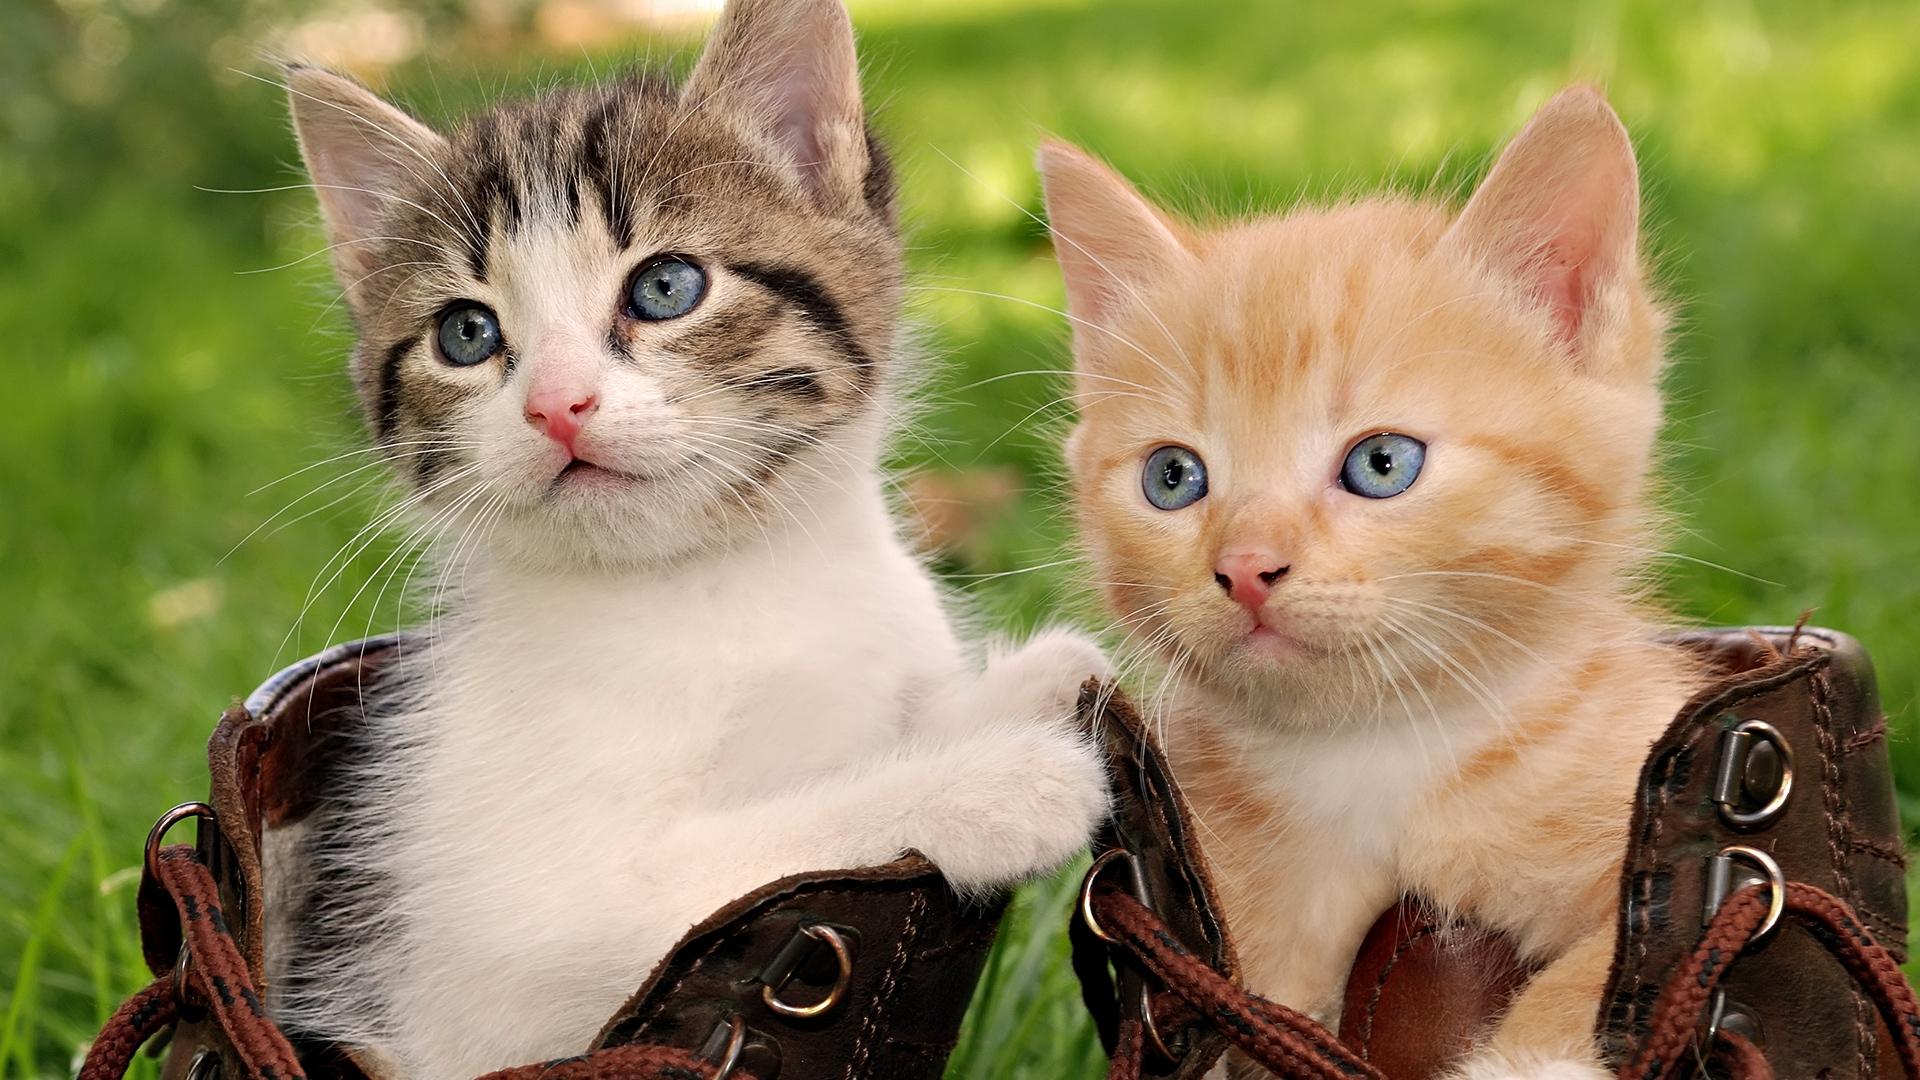 Wallpaper download cat - Hd Cat Pictures Wallpaper Hd